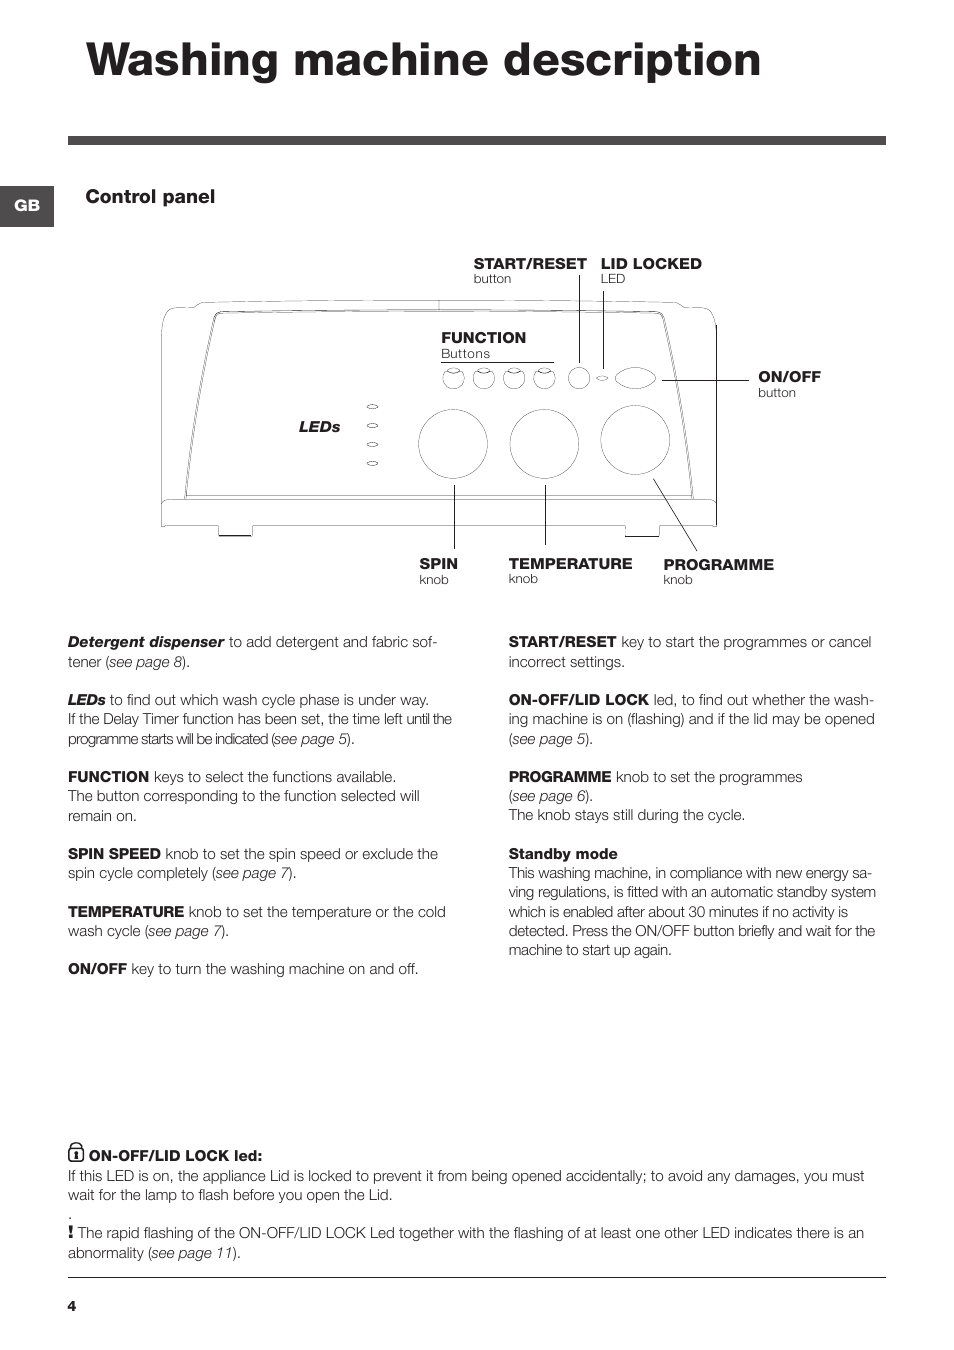 Washing Machine Description Control Panel